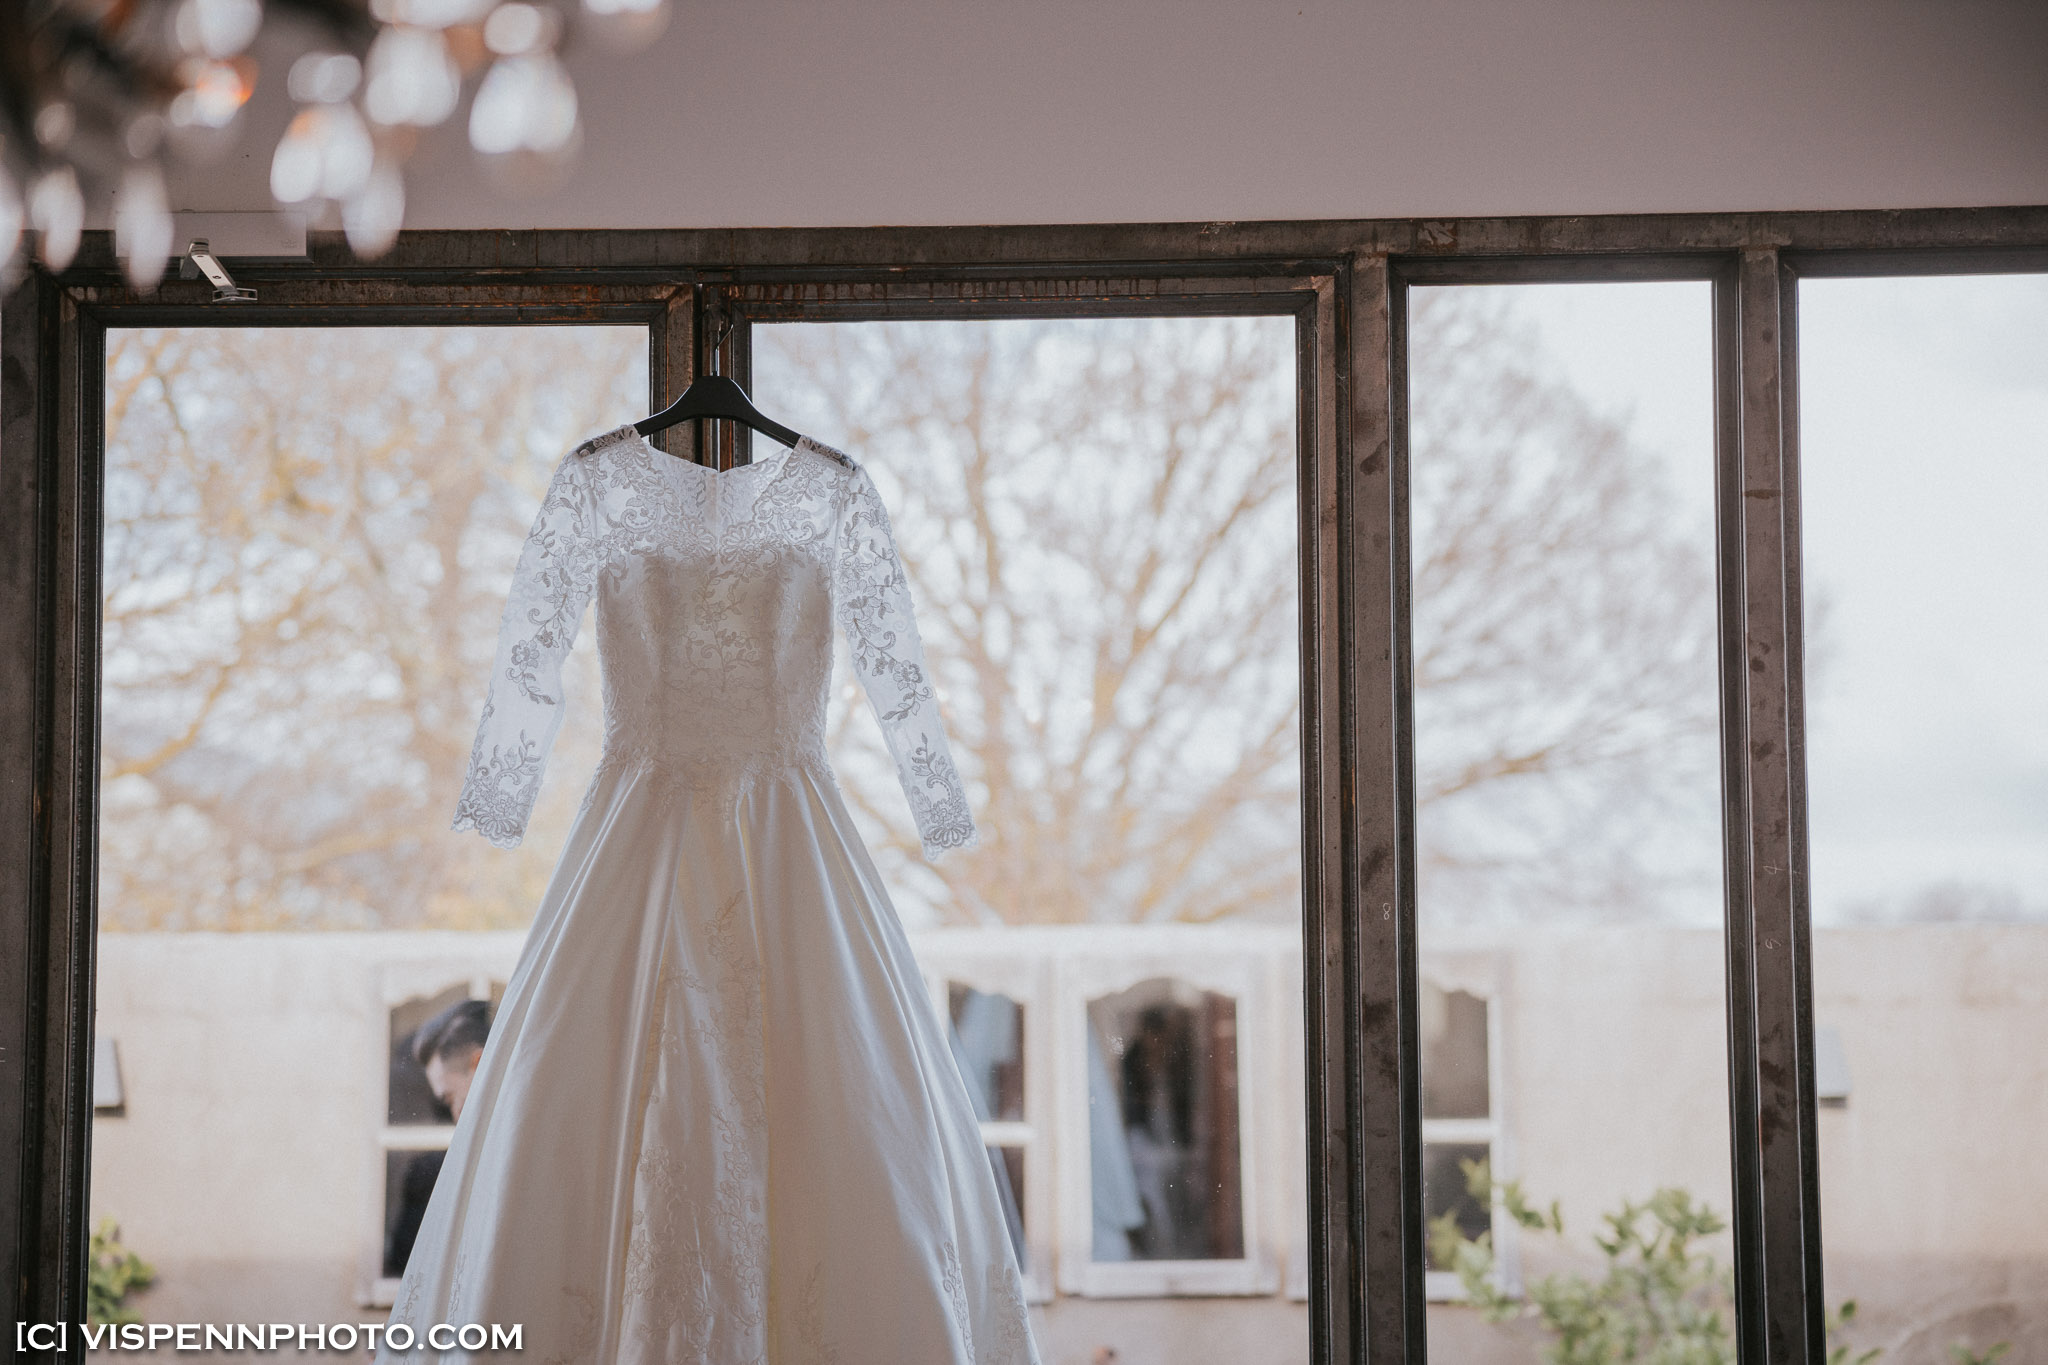 WEDDING DAY Photography Melbourne VISPENN 墨尔本 婚礼跟拍 婚礼摄像 婚礼摄影 结婚照 登记照 CoreyCoco 1P 00051 EOSR VISPENN